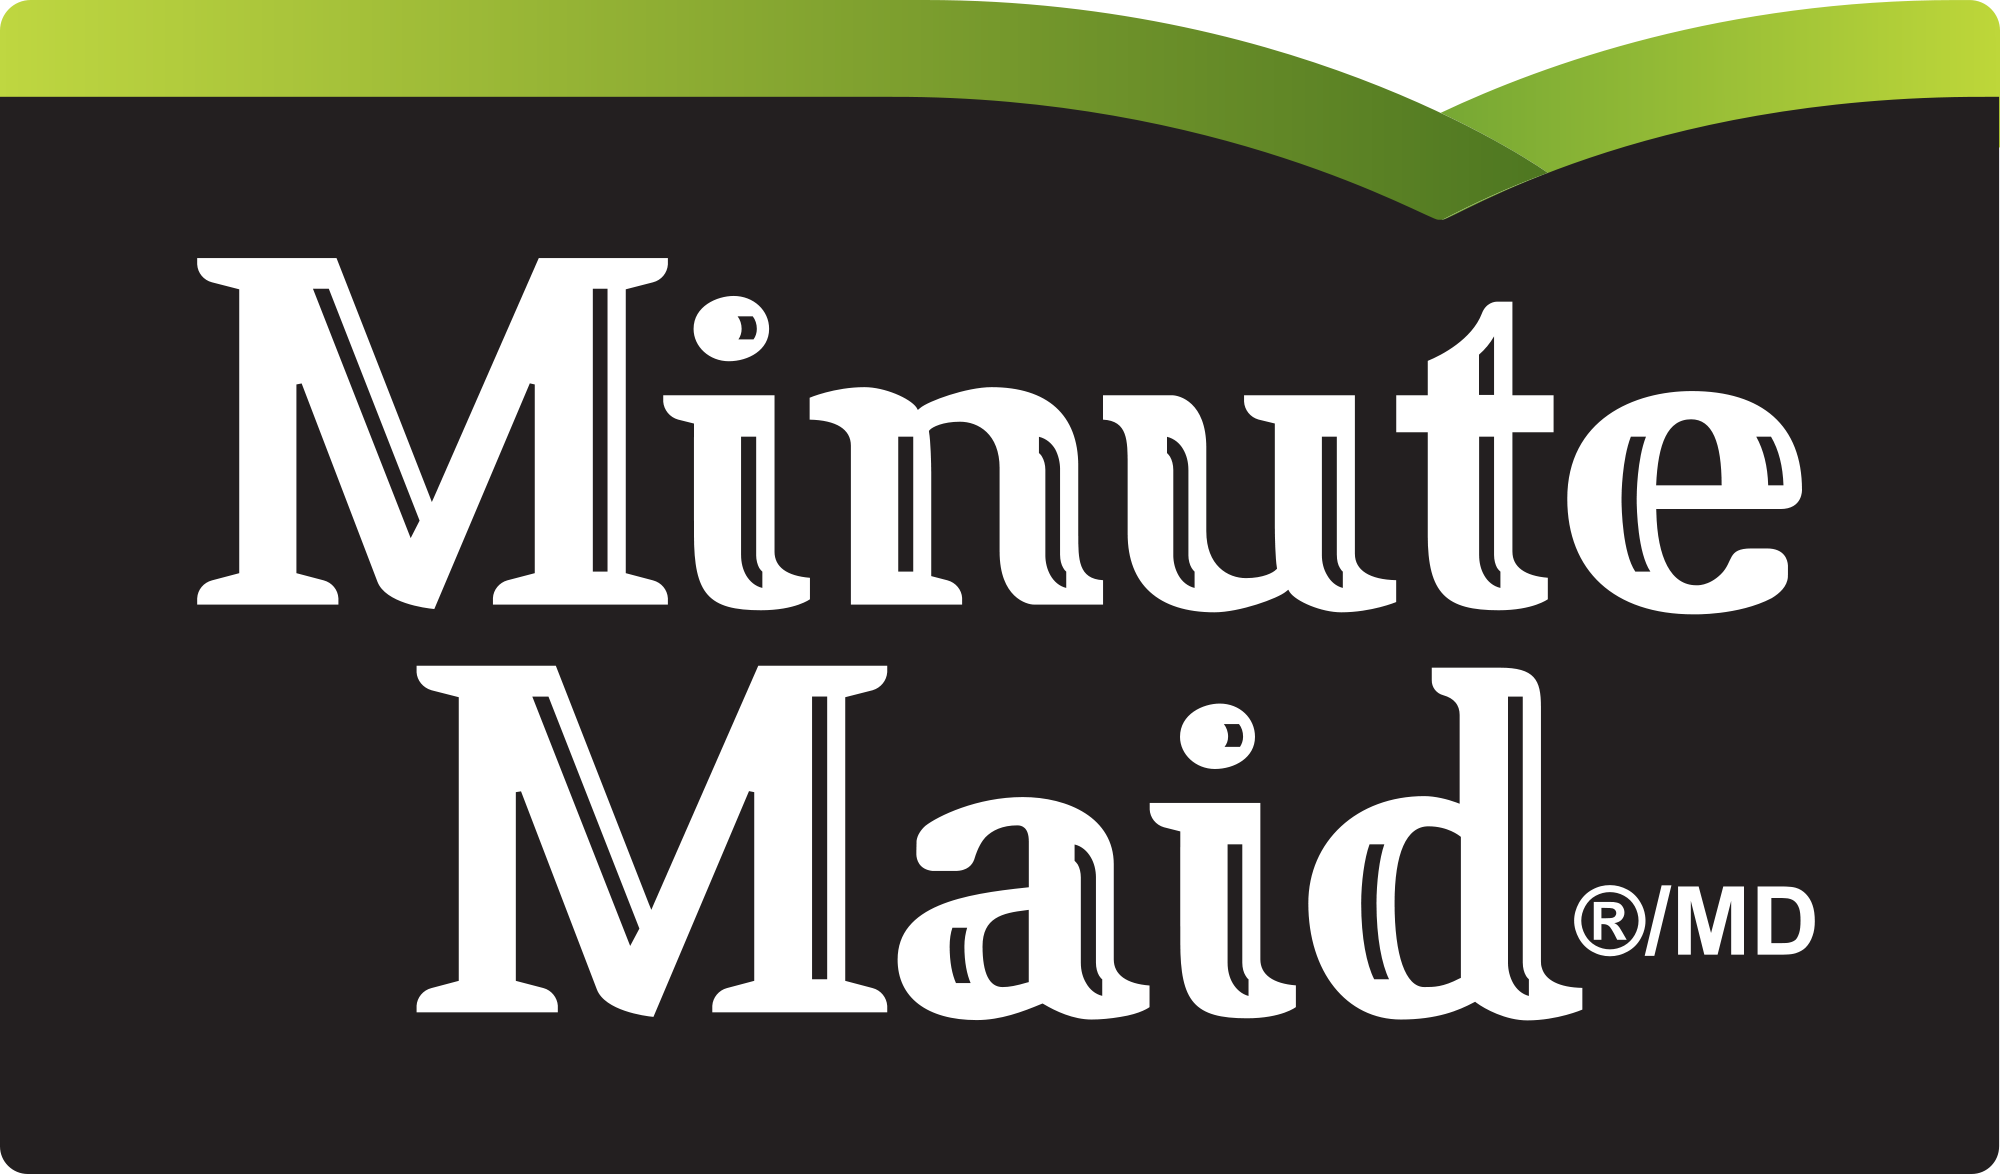 Télephone information entreprise  Minute Maid